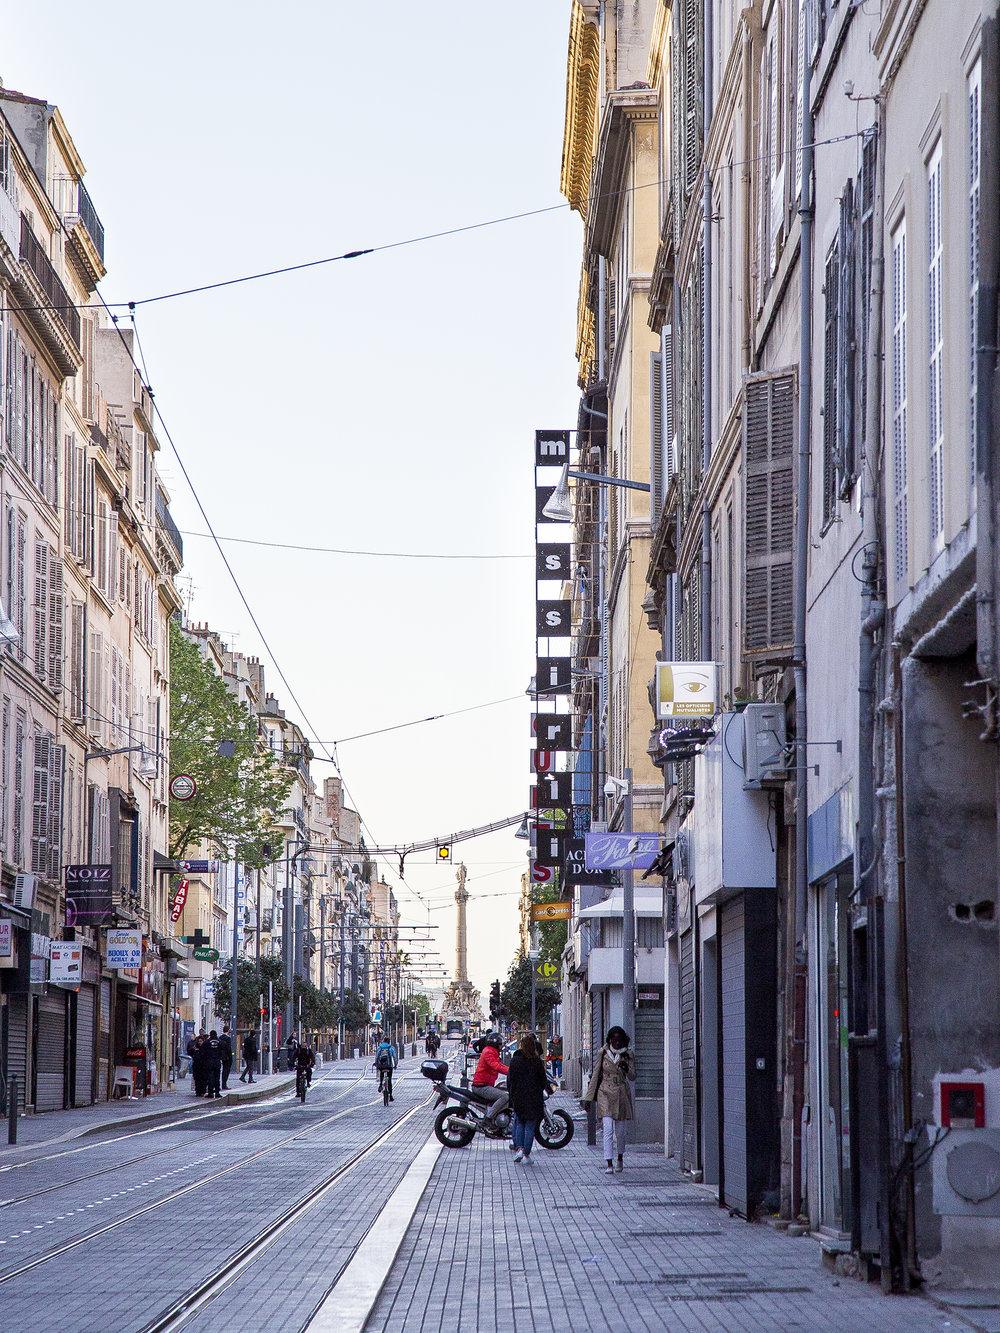 Marseille France Street Photograph